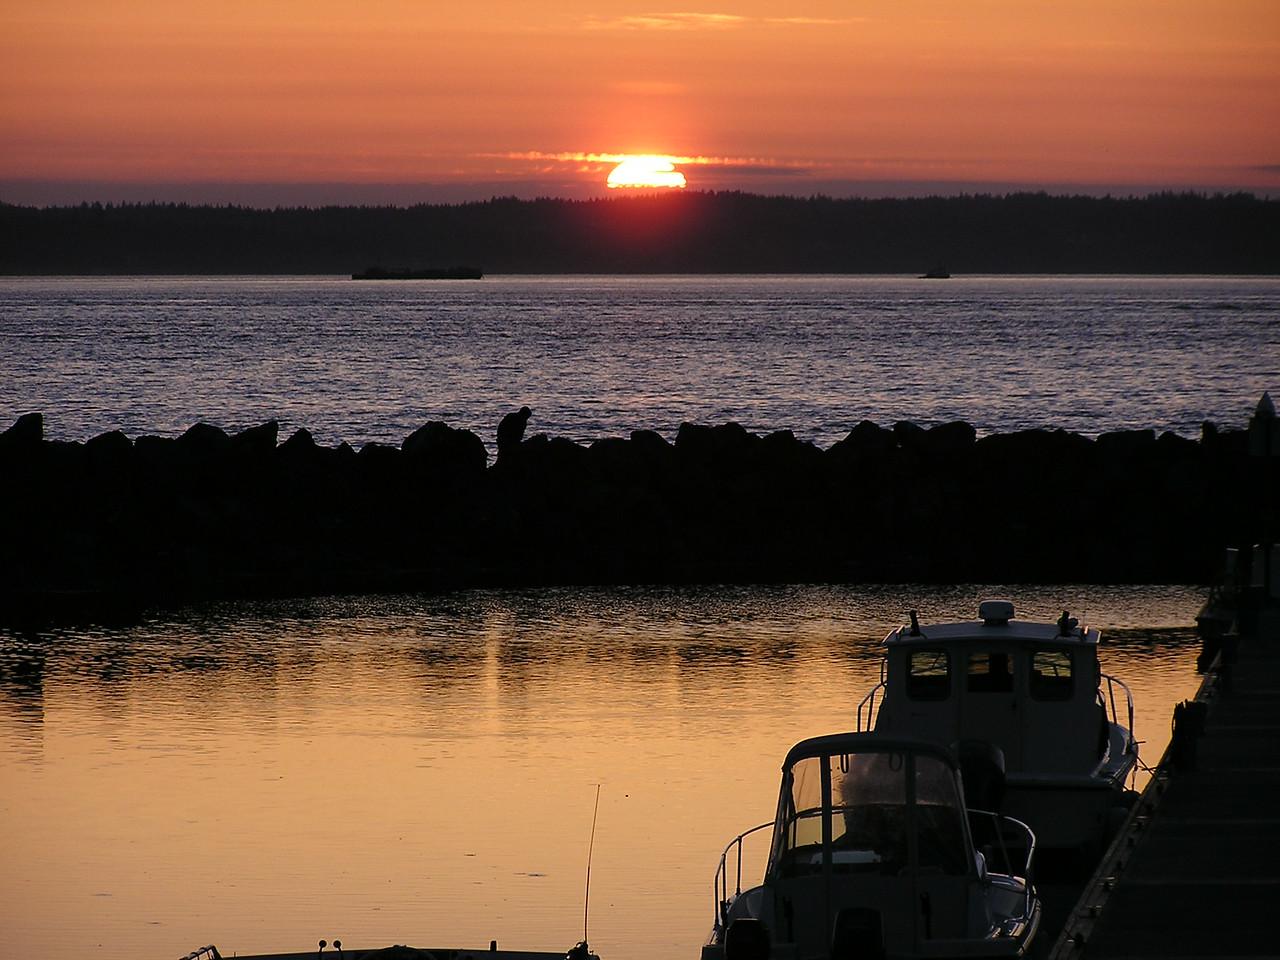 07 06 20 Sunset 010